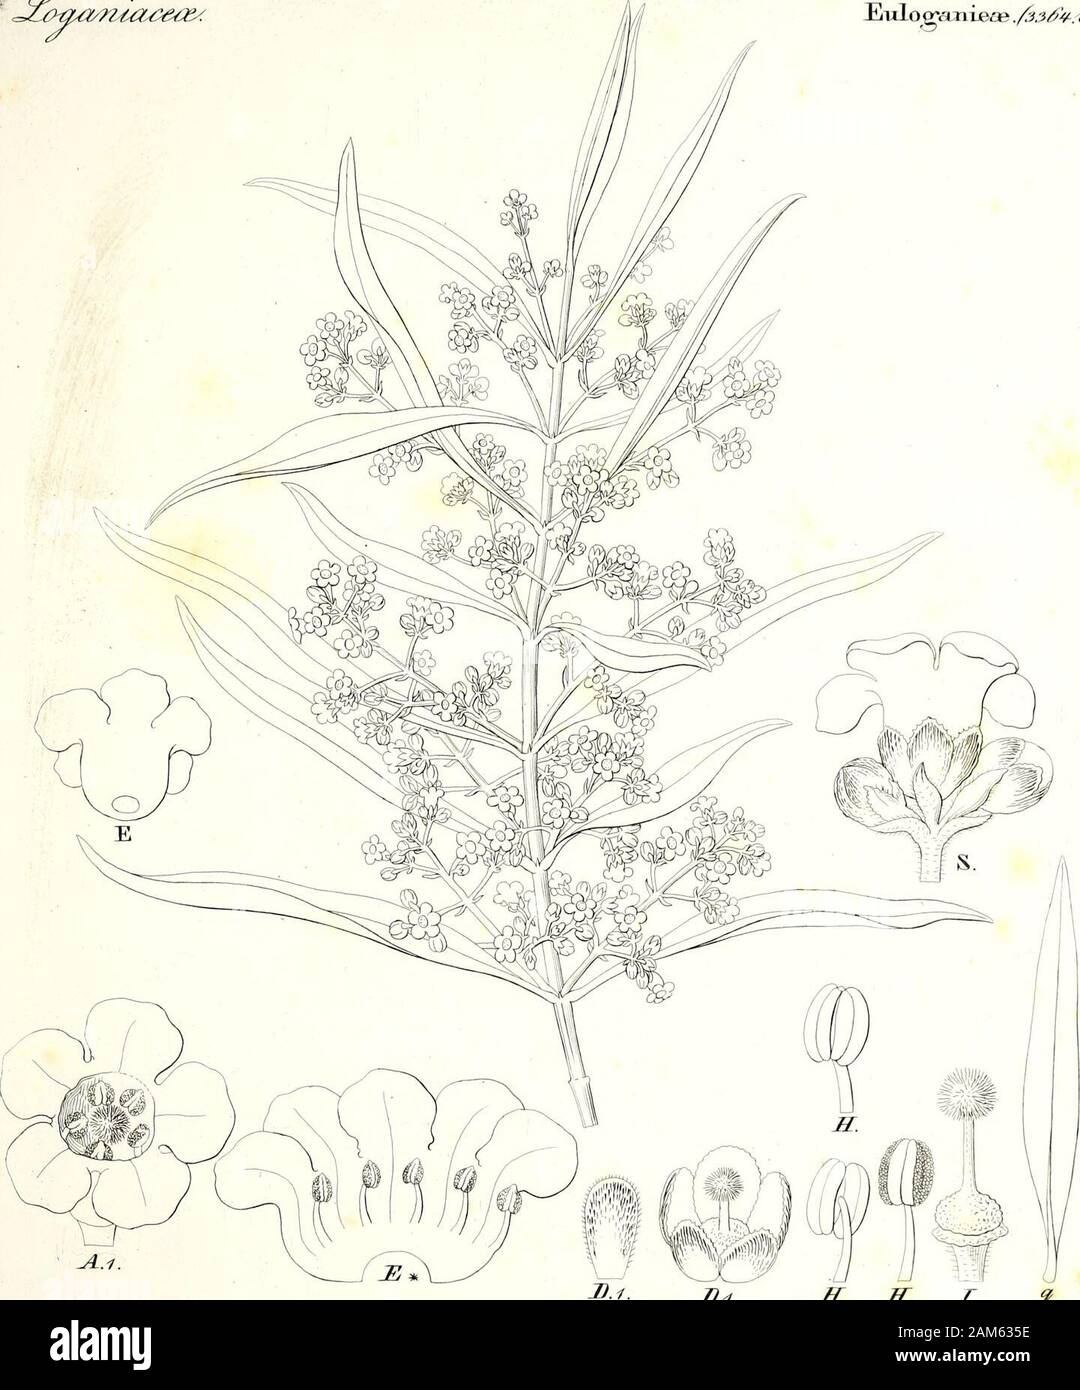 Iconographia generum plantarum . (toi i.iyu4t£esr£cs>k e&? ^i&t), dtC, ryV?i£dn/w JidotHisJ/t^ . fSf/r/i<l /<*<?, J&ma/nuu&ce/. Eulogcmieae ./jjtfp. ^J. Stock Photo